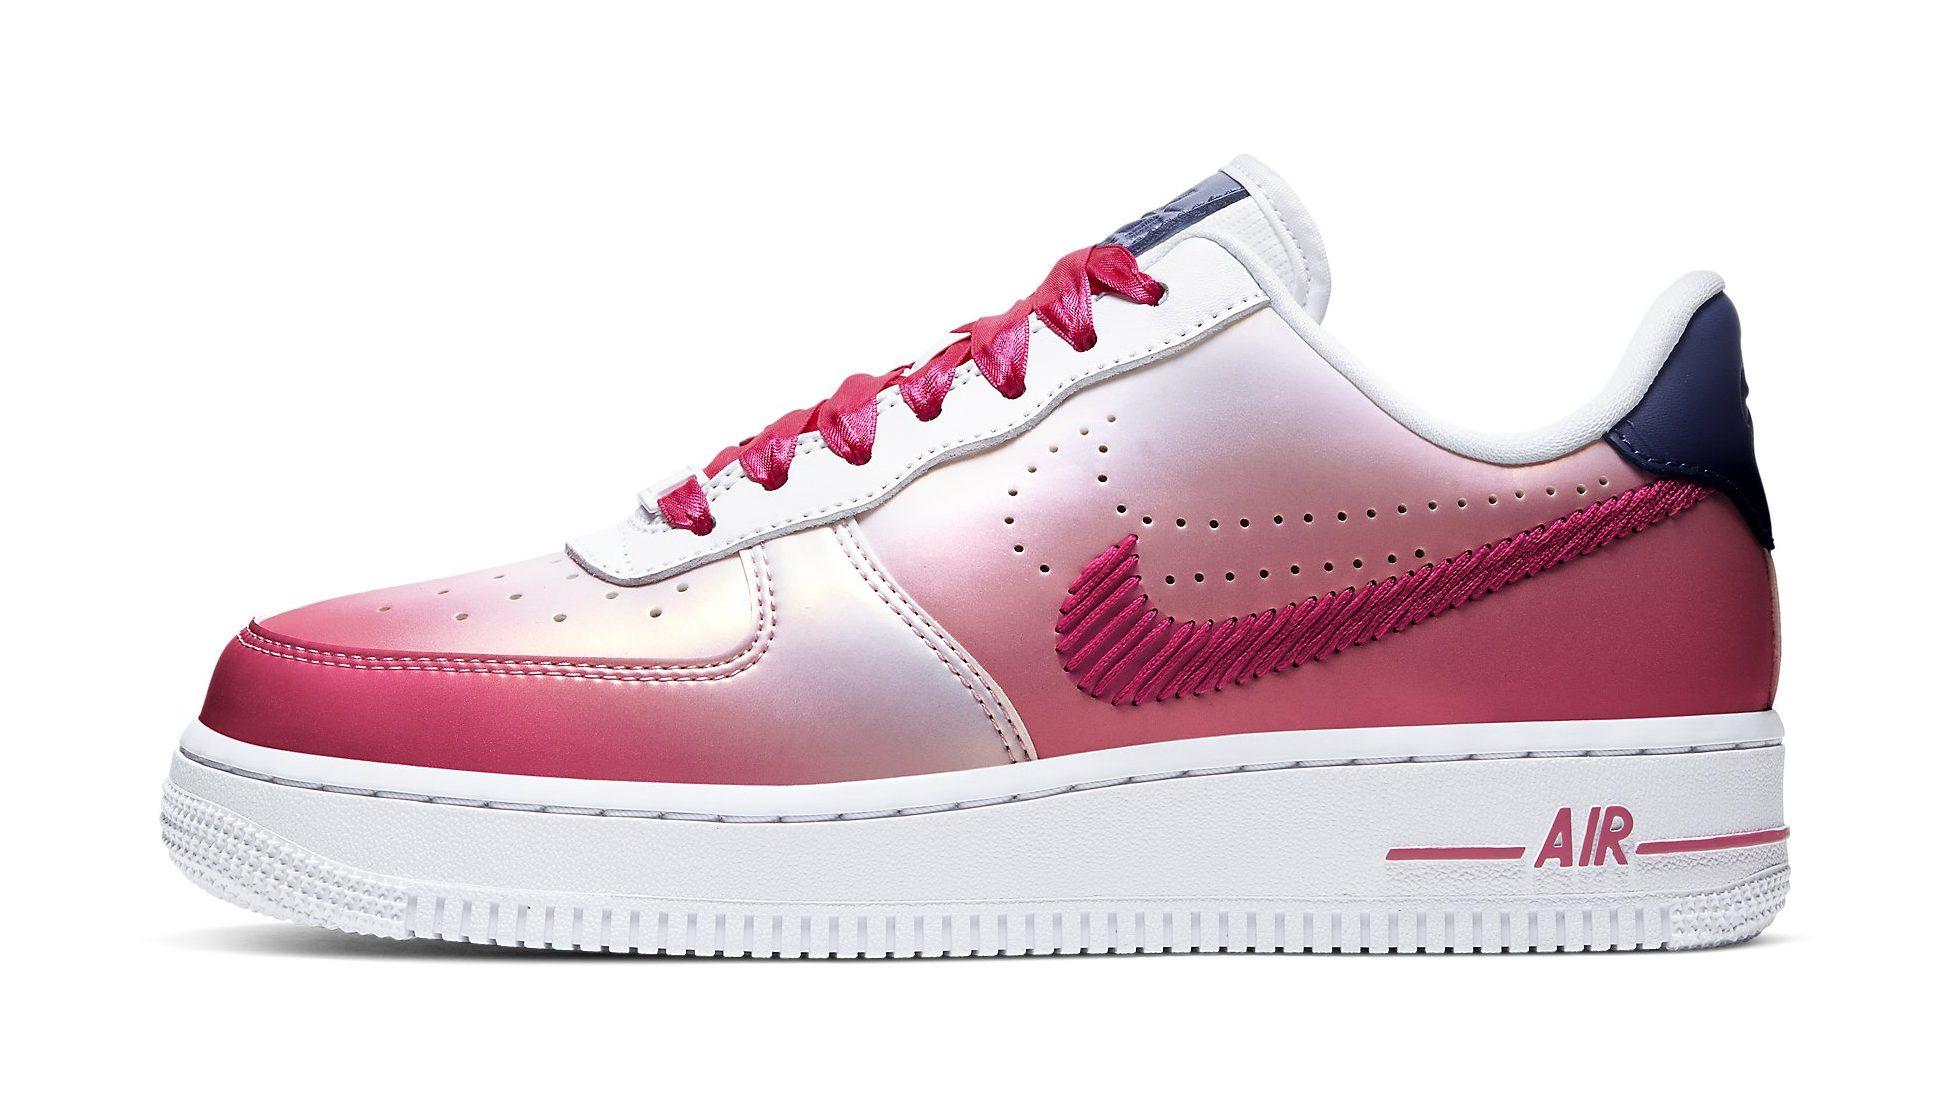 Nike 'Kay Yow' Breast Cancer Awareness